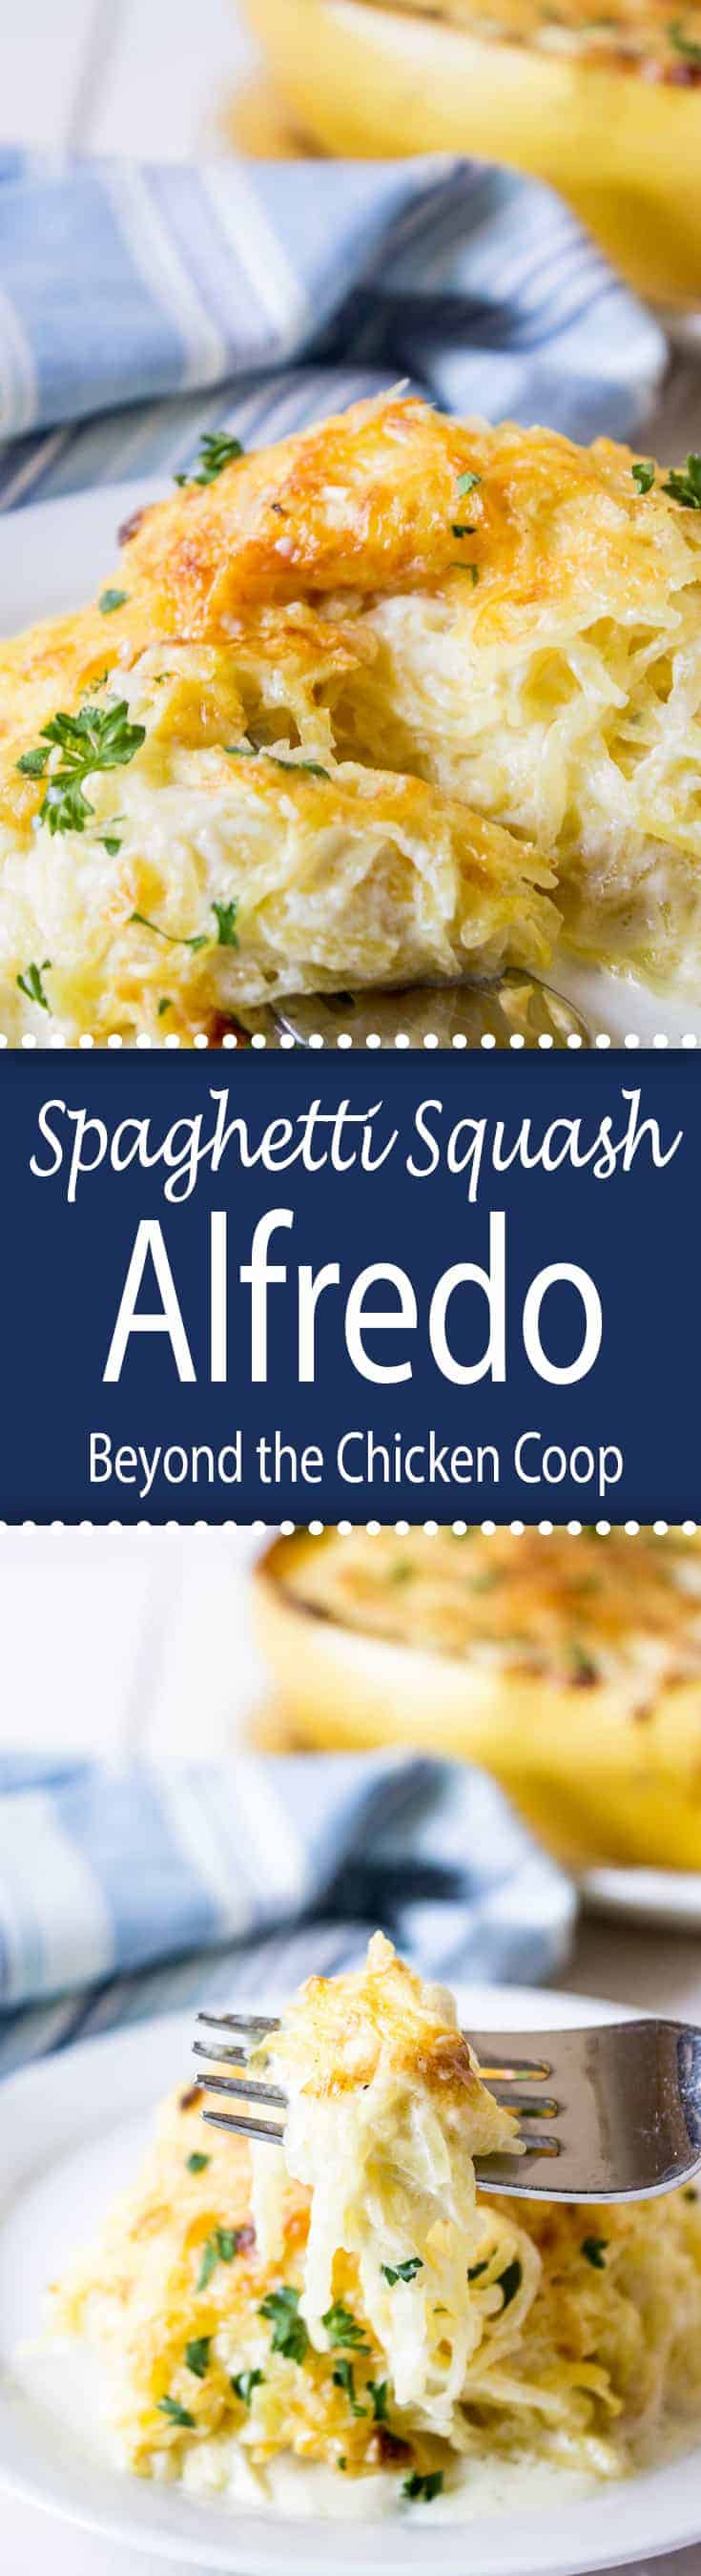 Spaghetti Squash Alfredo is cheesy and delicious.  #spaghettisquash #Alfredo #cheesybakedsquash #bakedspaghettisquash